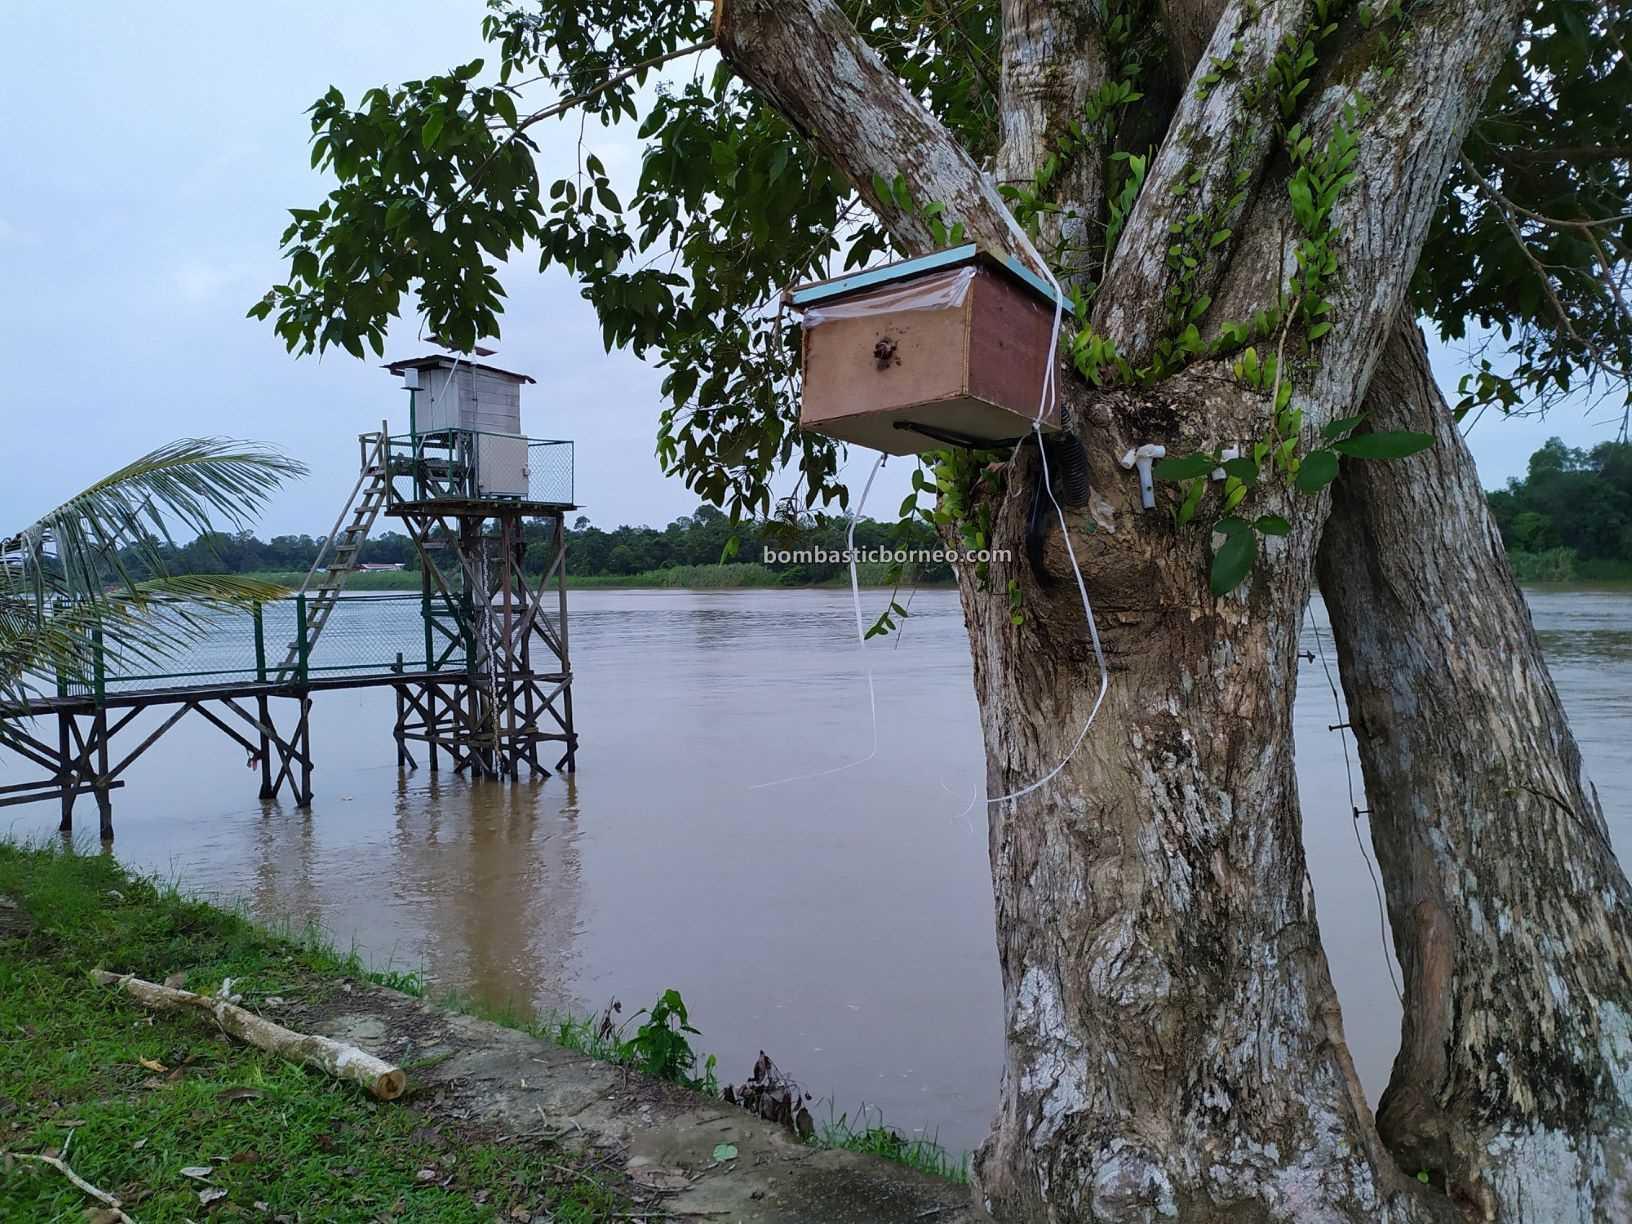 adventure, interior, backpackers, Destination, exploration, Miri, town, Tourism, Trans Borneo, 跨境婆罗洲马来西亚, 砂拉越美里马鲁帝